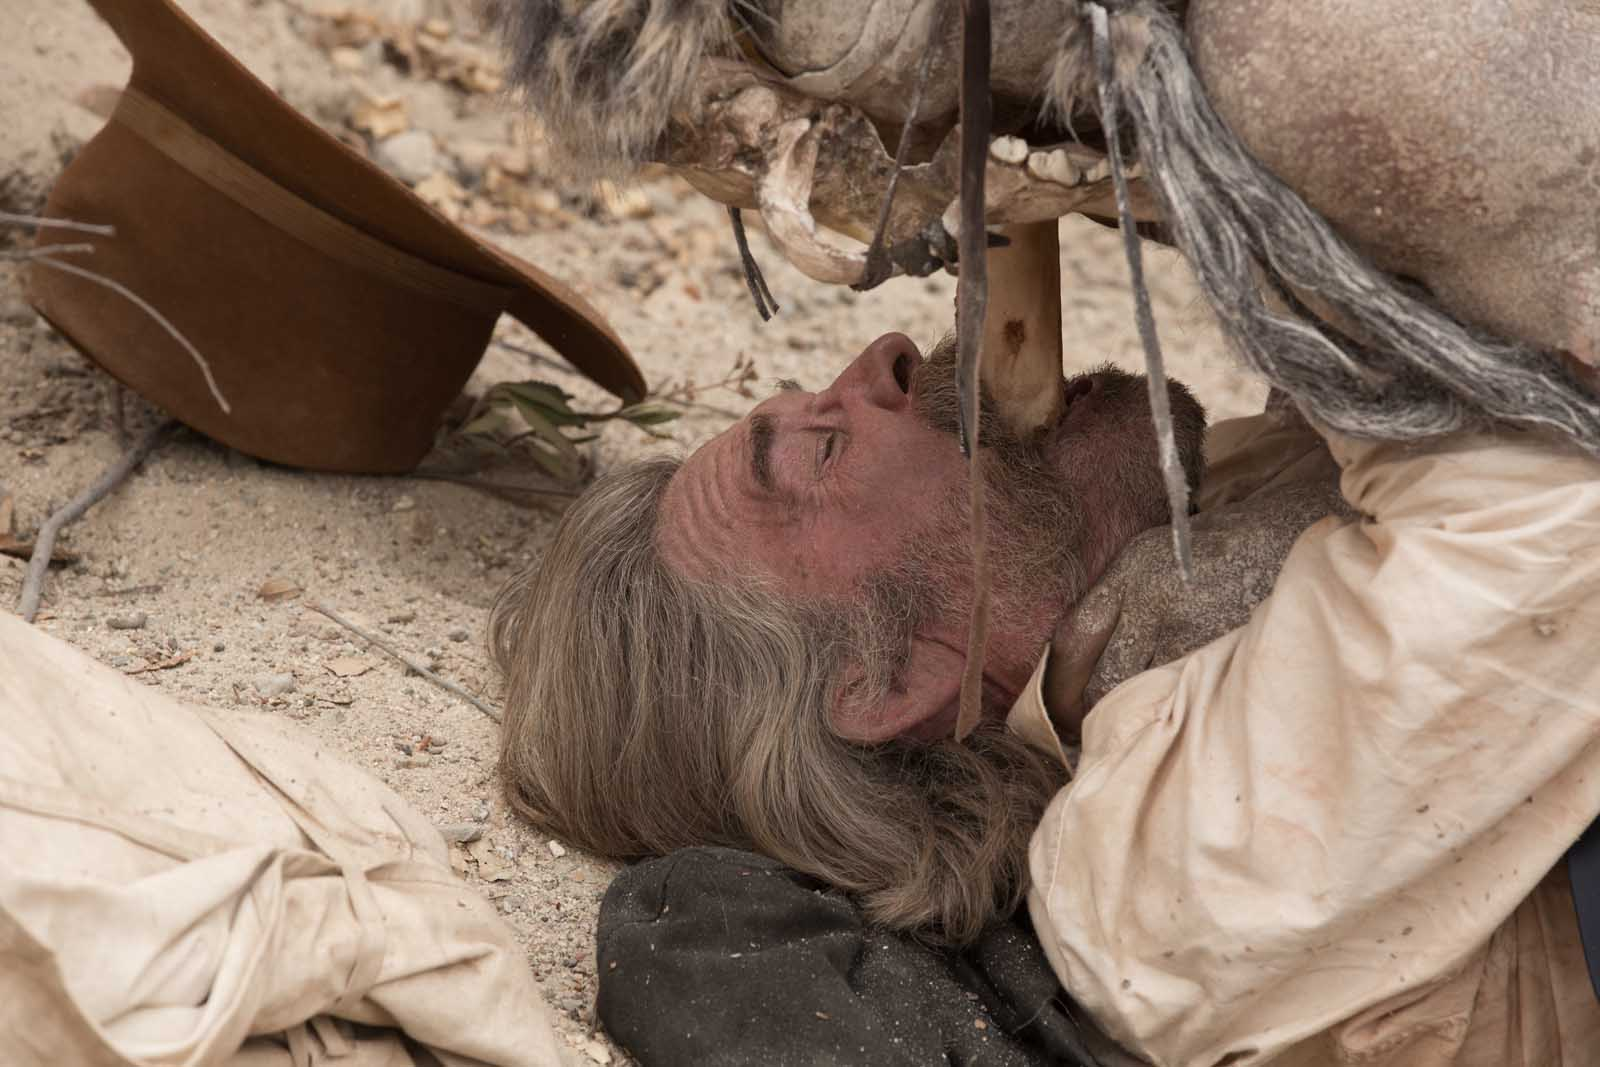 Bone Tomahawk de S. Craig Zahler - 2015 / Horreur